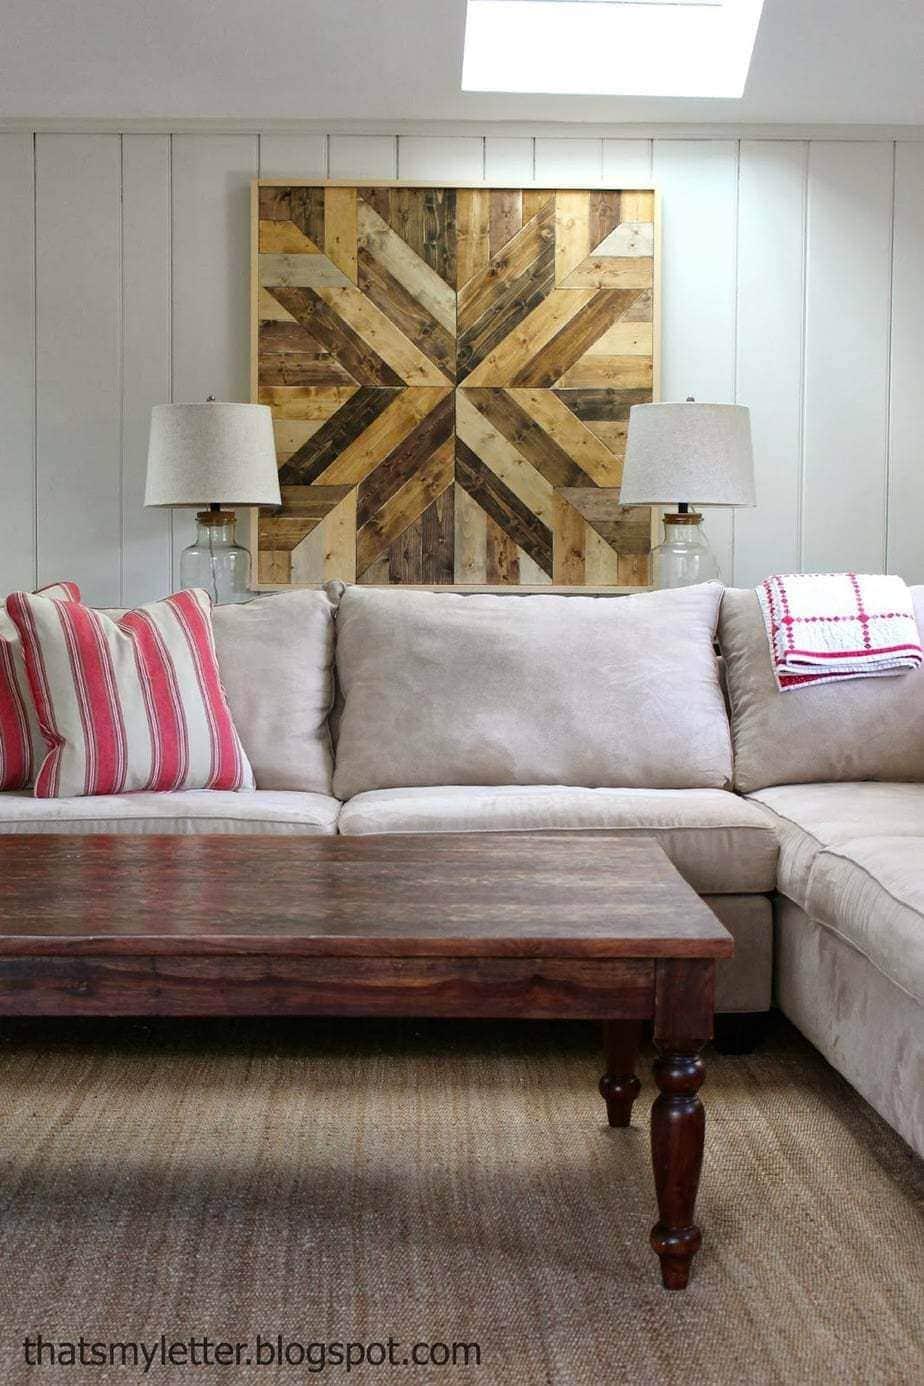 Diy Wood Planked Quilt Jaime Costiglio